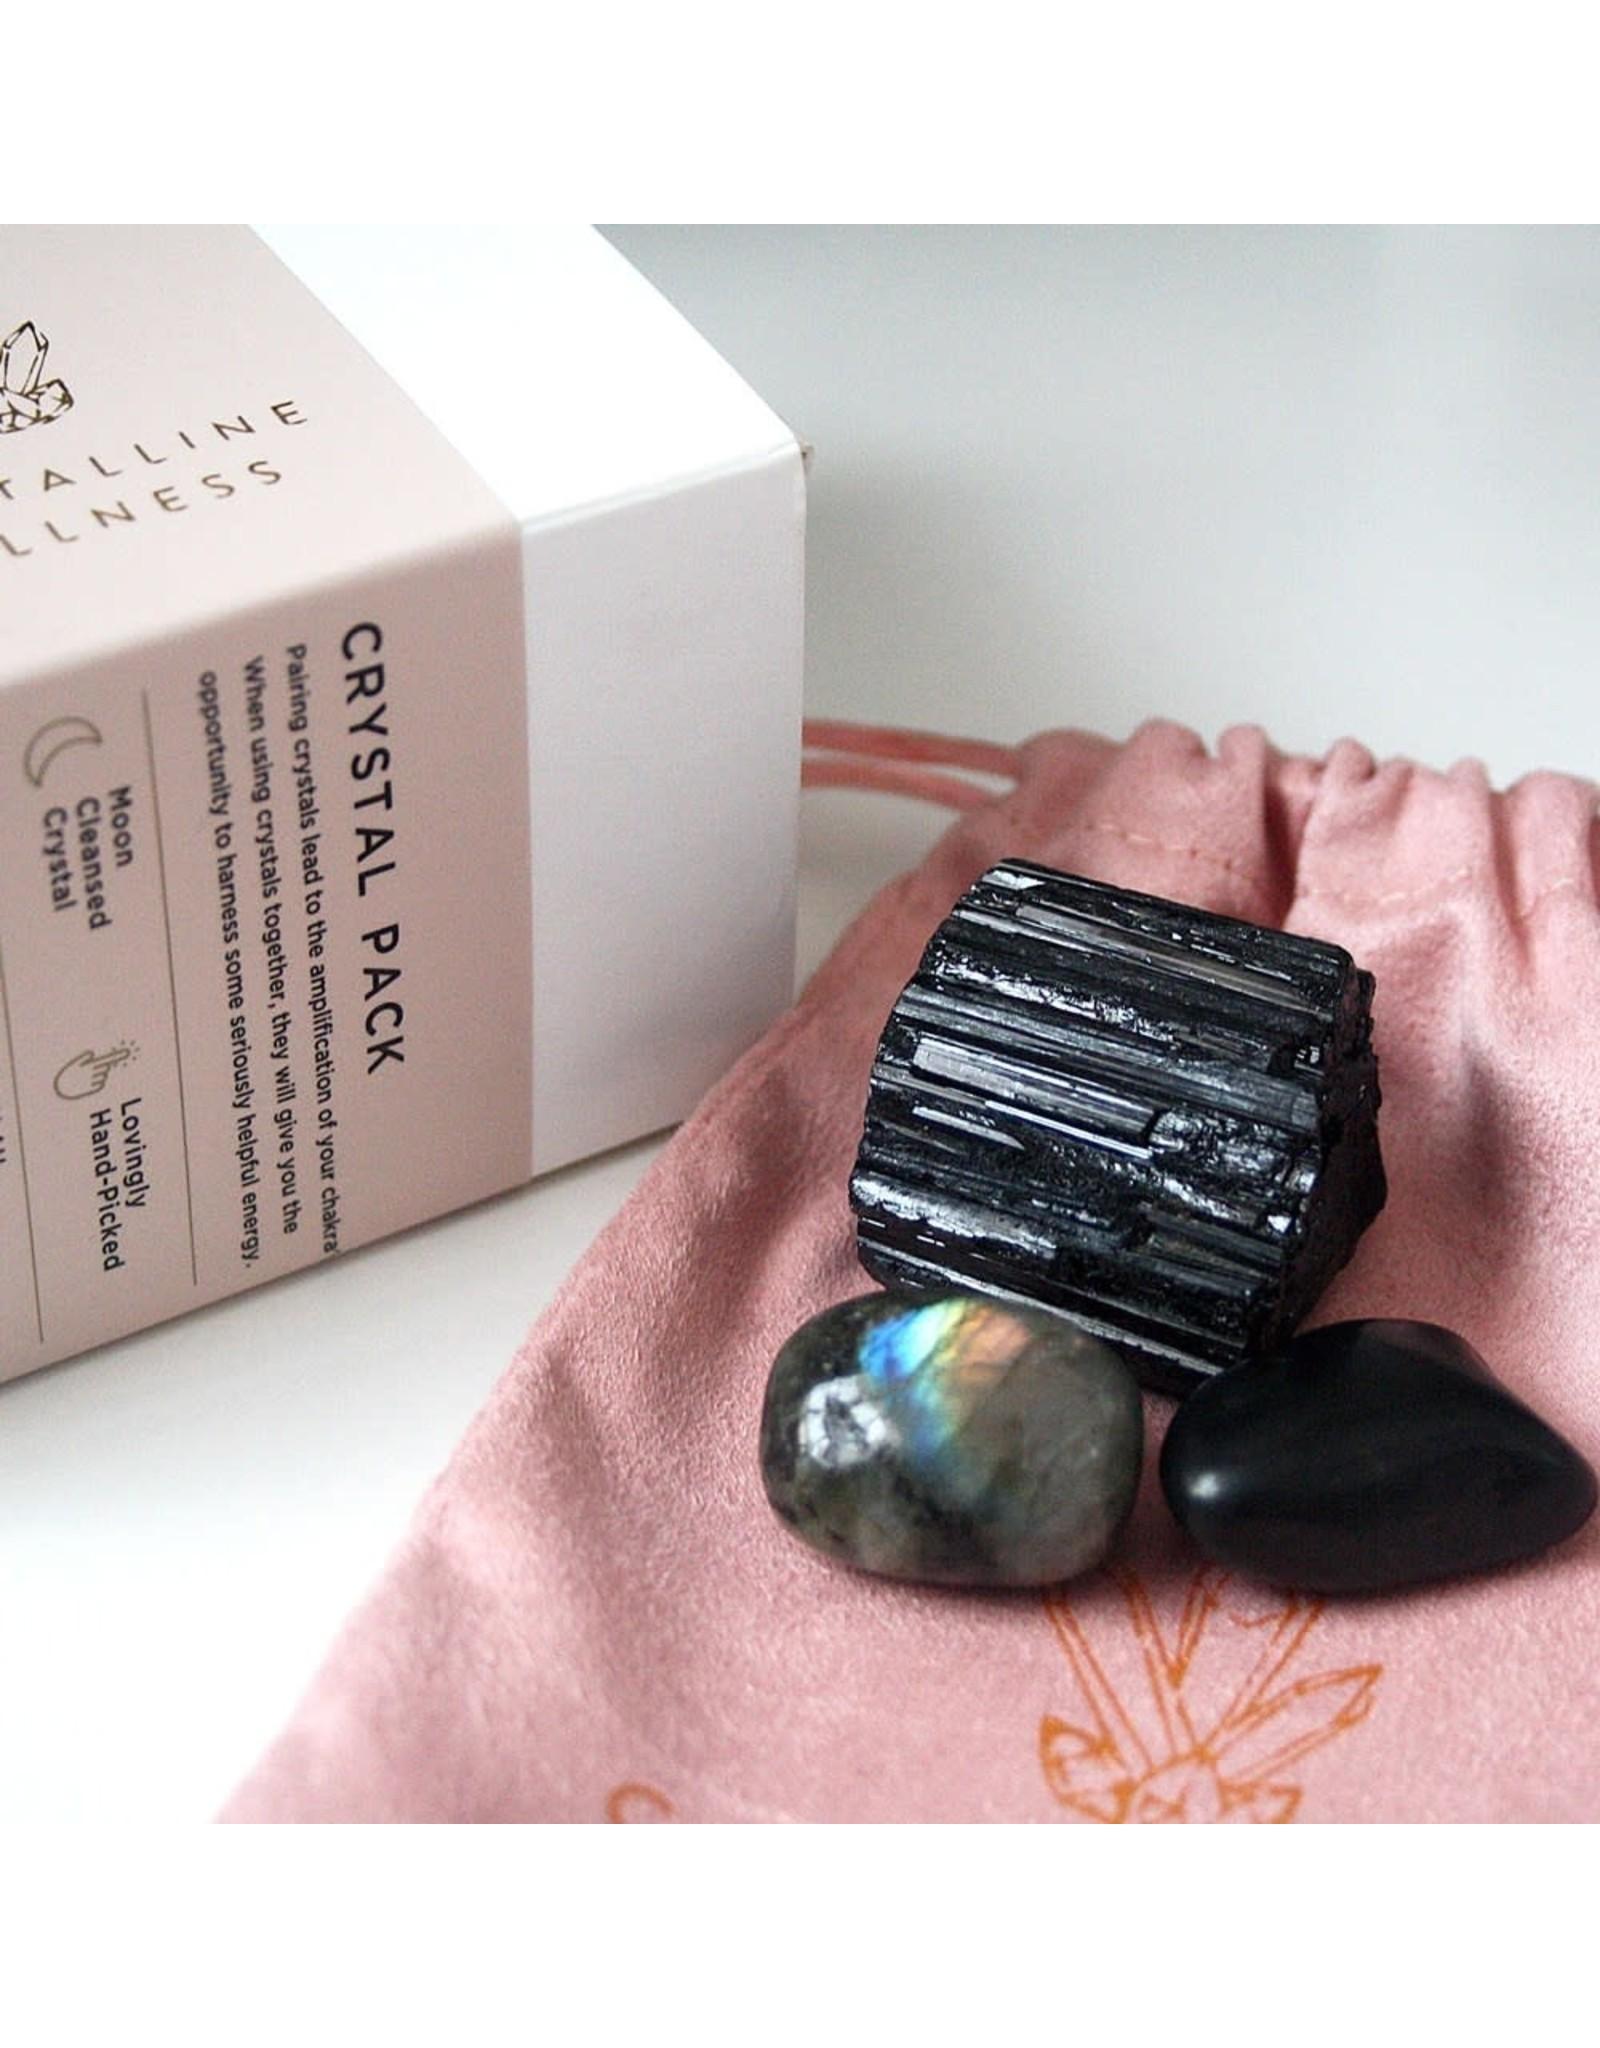 Crystalline Wellness Crystal Packs - Protection